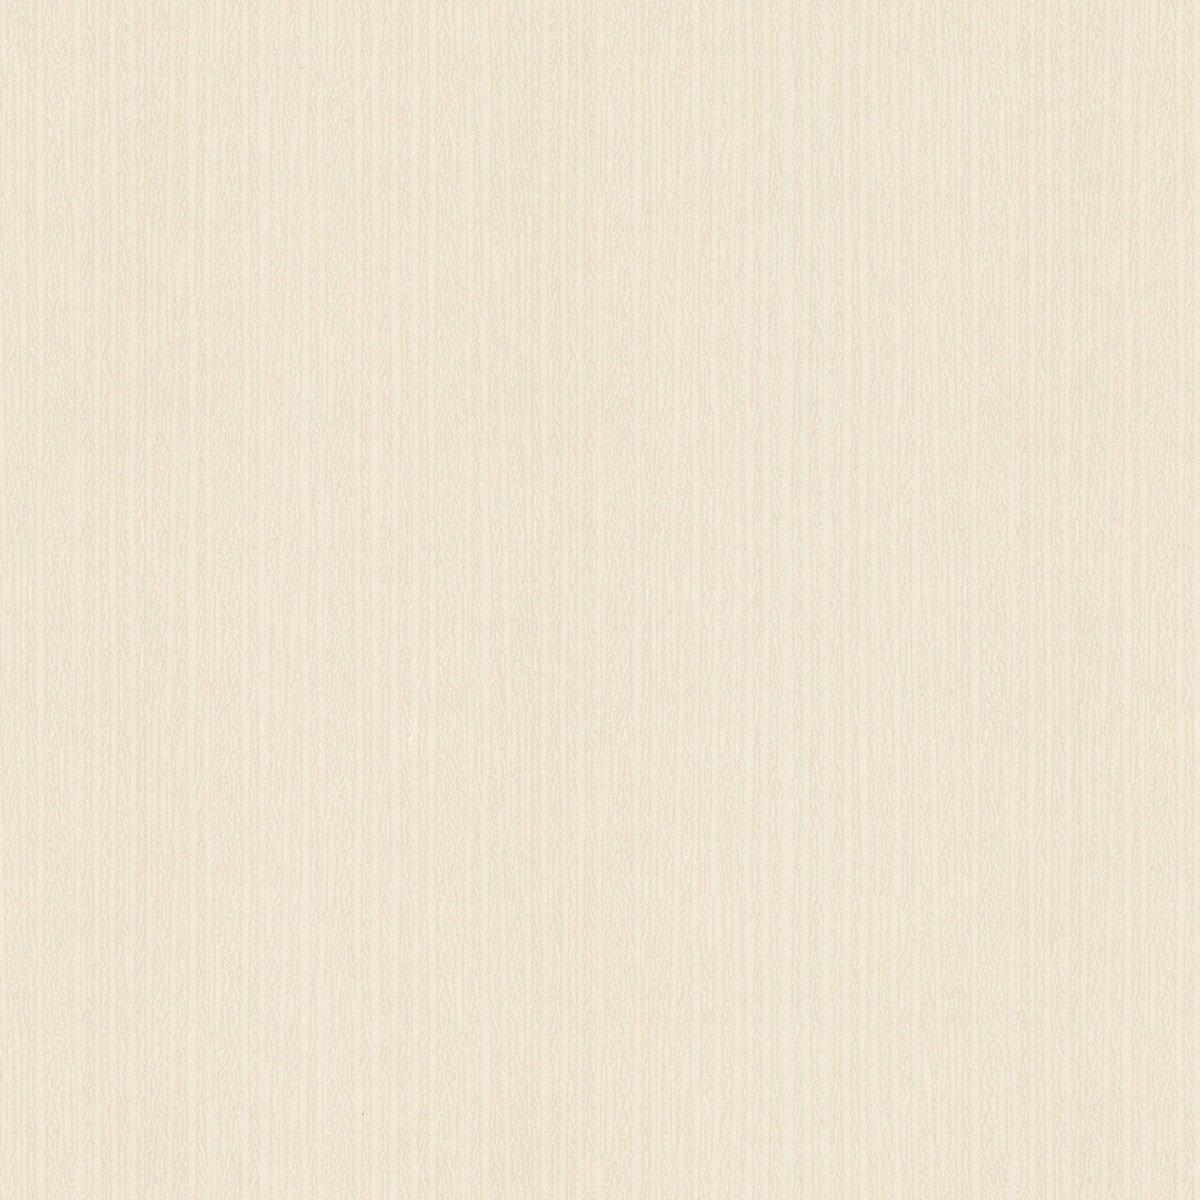 Обои Wallquest Vivaldi B03254/10, интернет магазин Волео